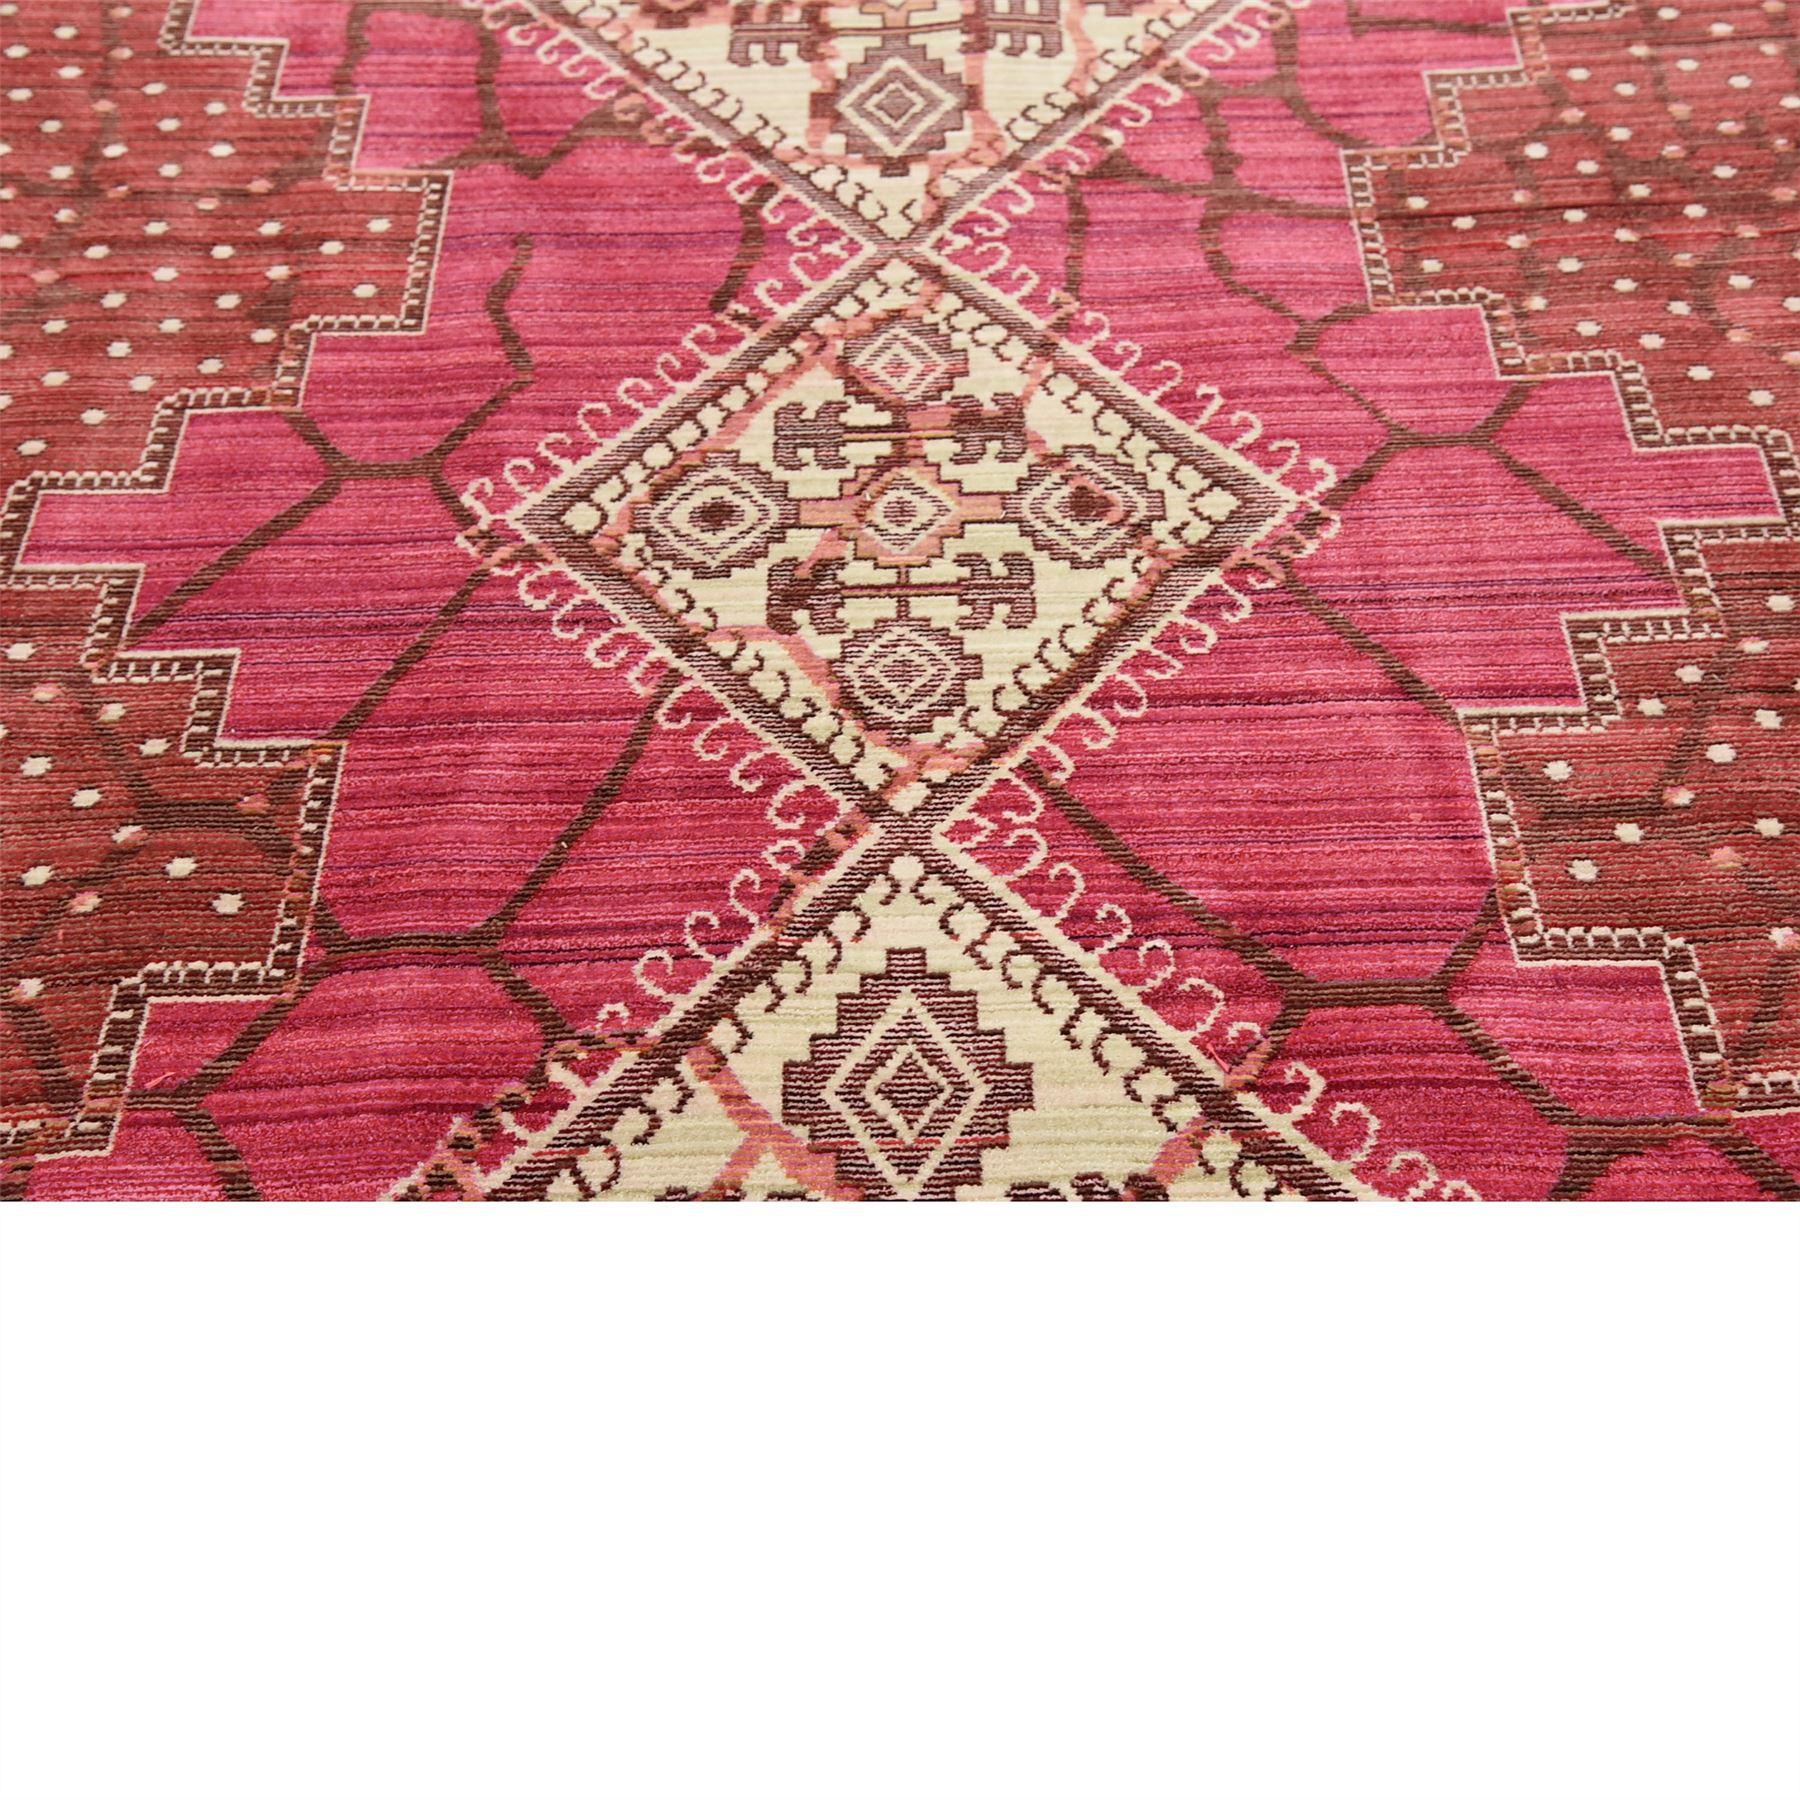 Retro Modern Rug: Modern Vintage Area Rugs Contemporary Carpet Round Magenta